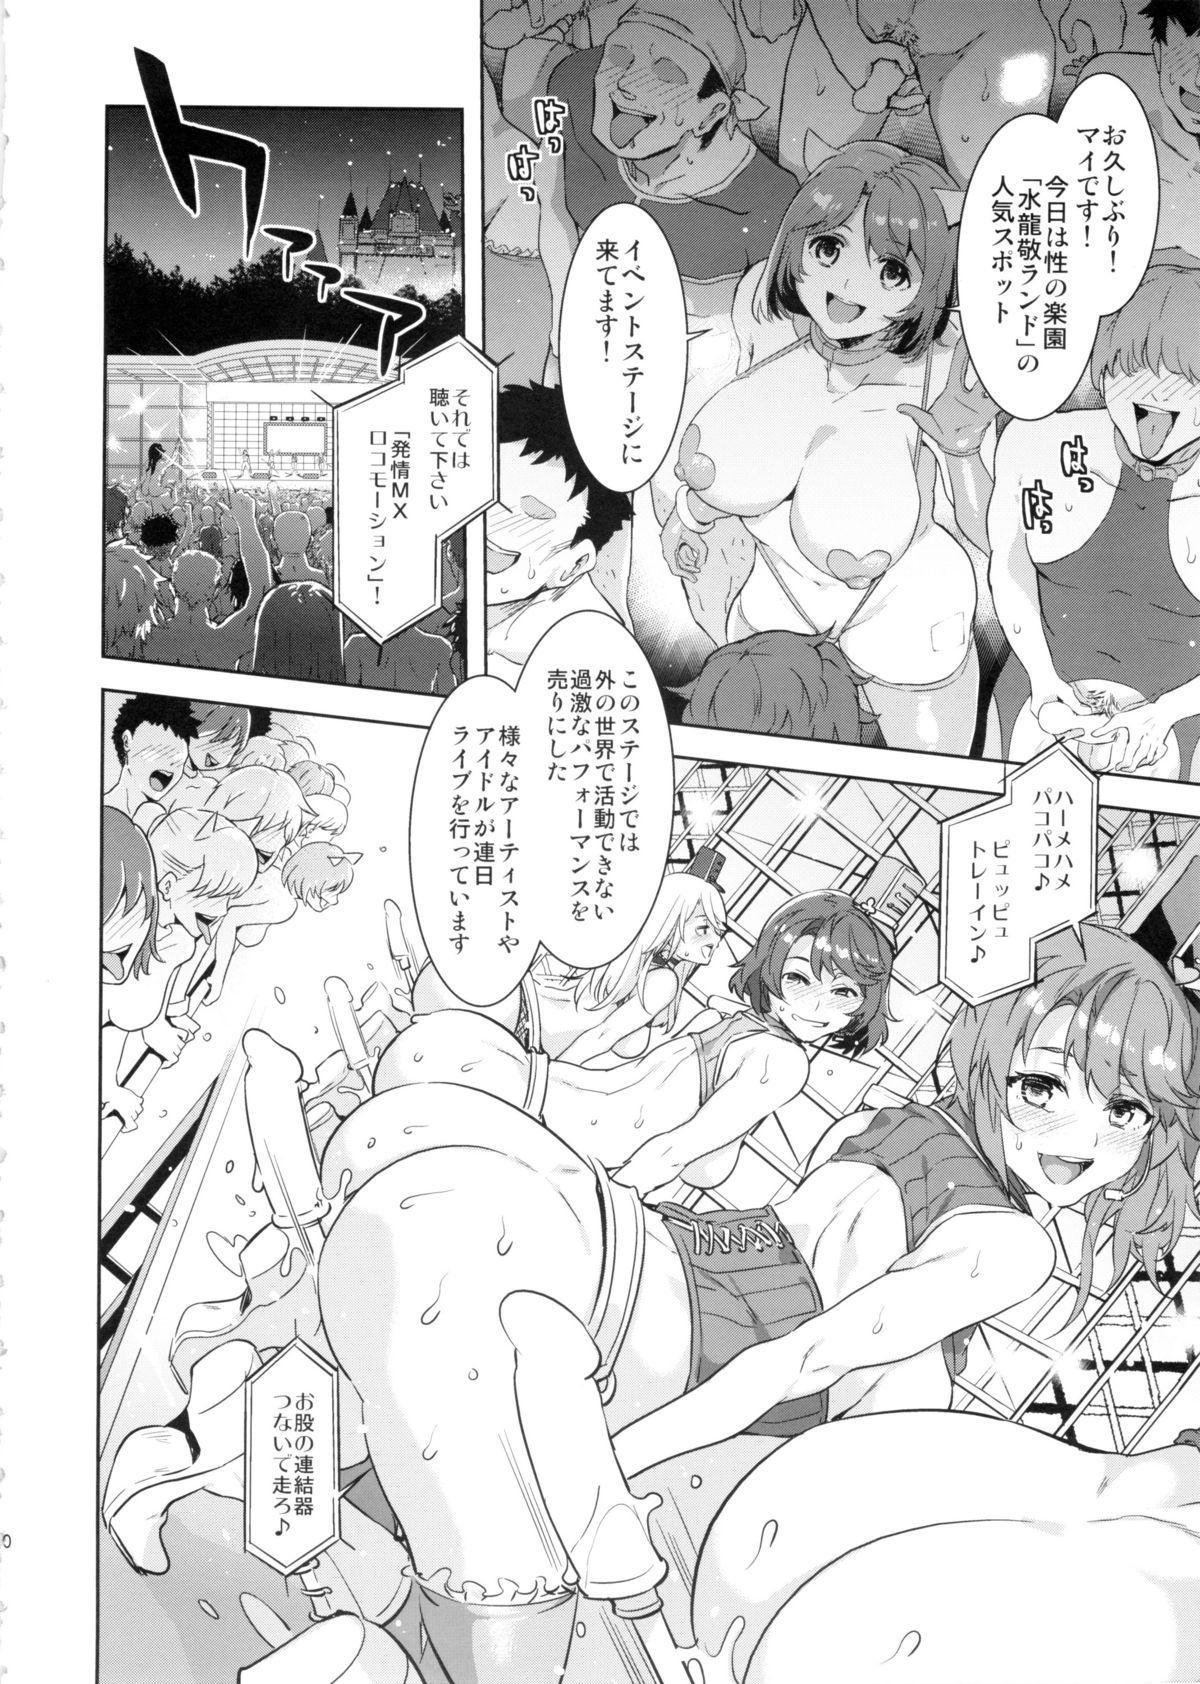 Oideyo! Mizuryu Kei Land the 3rd Day 9